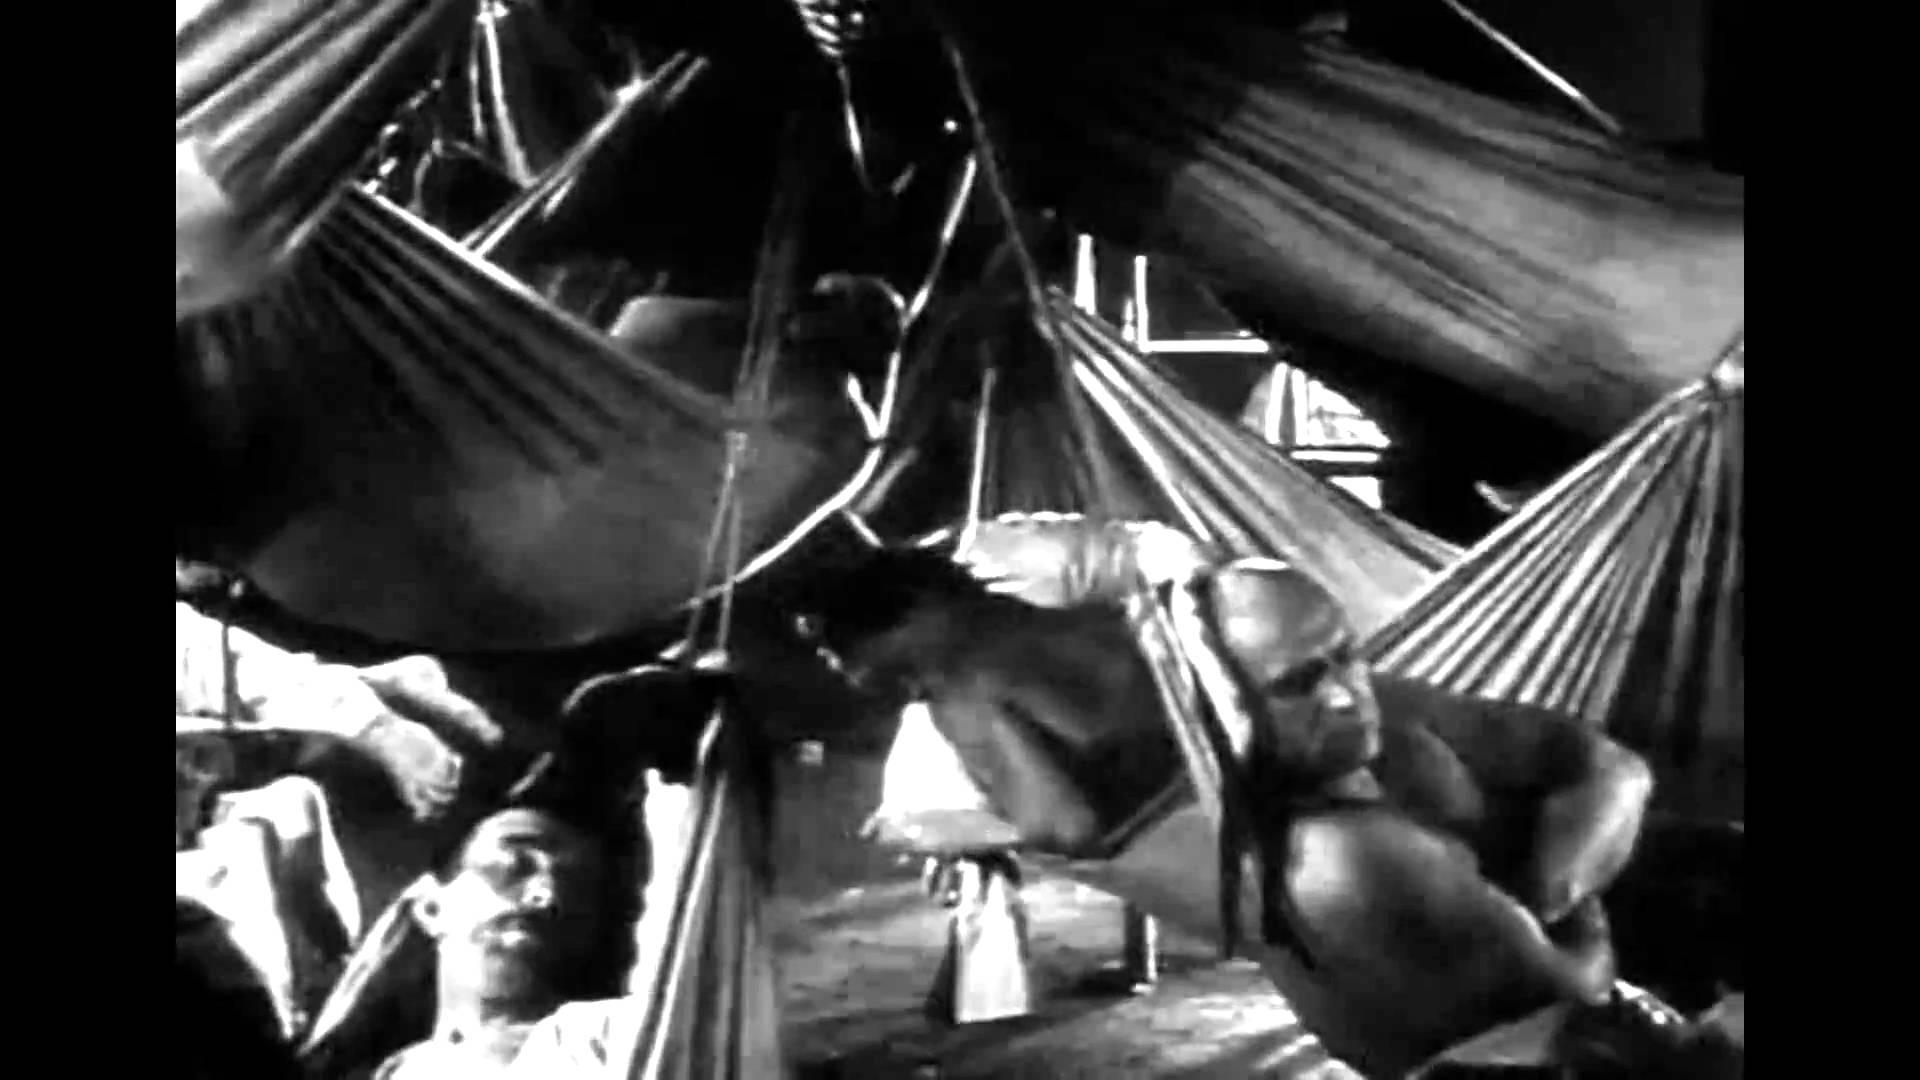 battleship potemkin Bronenosets potemkin (1925) director: sergei eisenstein actors: aleksandr antonov, vladimir barsky, grigori aleksandrov runtime: 75 min battleship potemkin is one of the most influential films of all time.